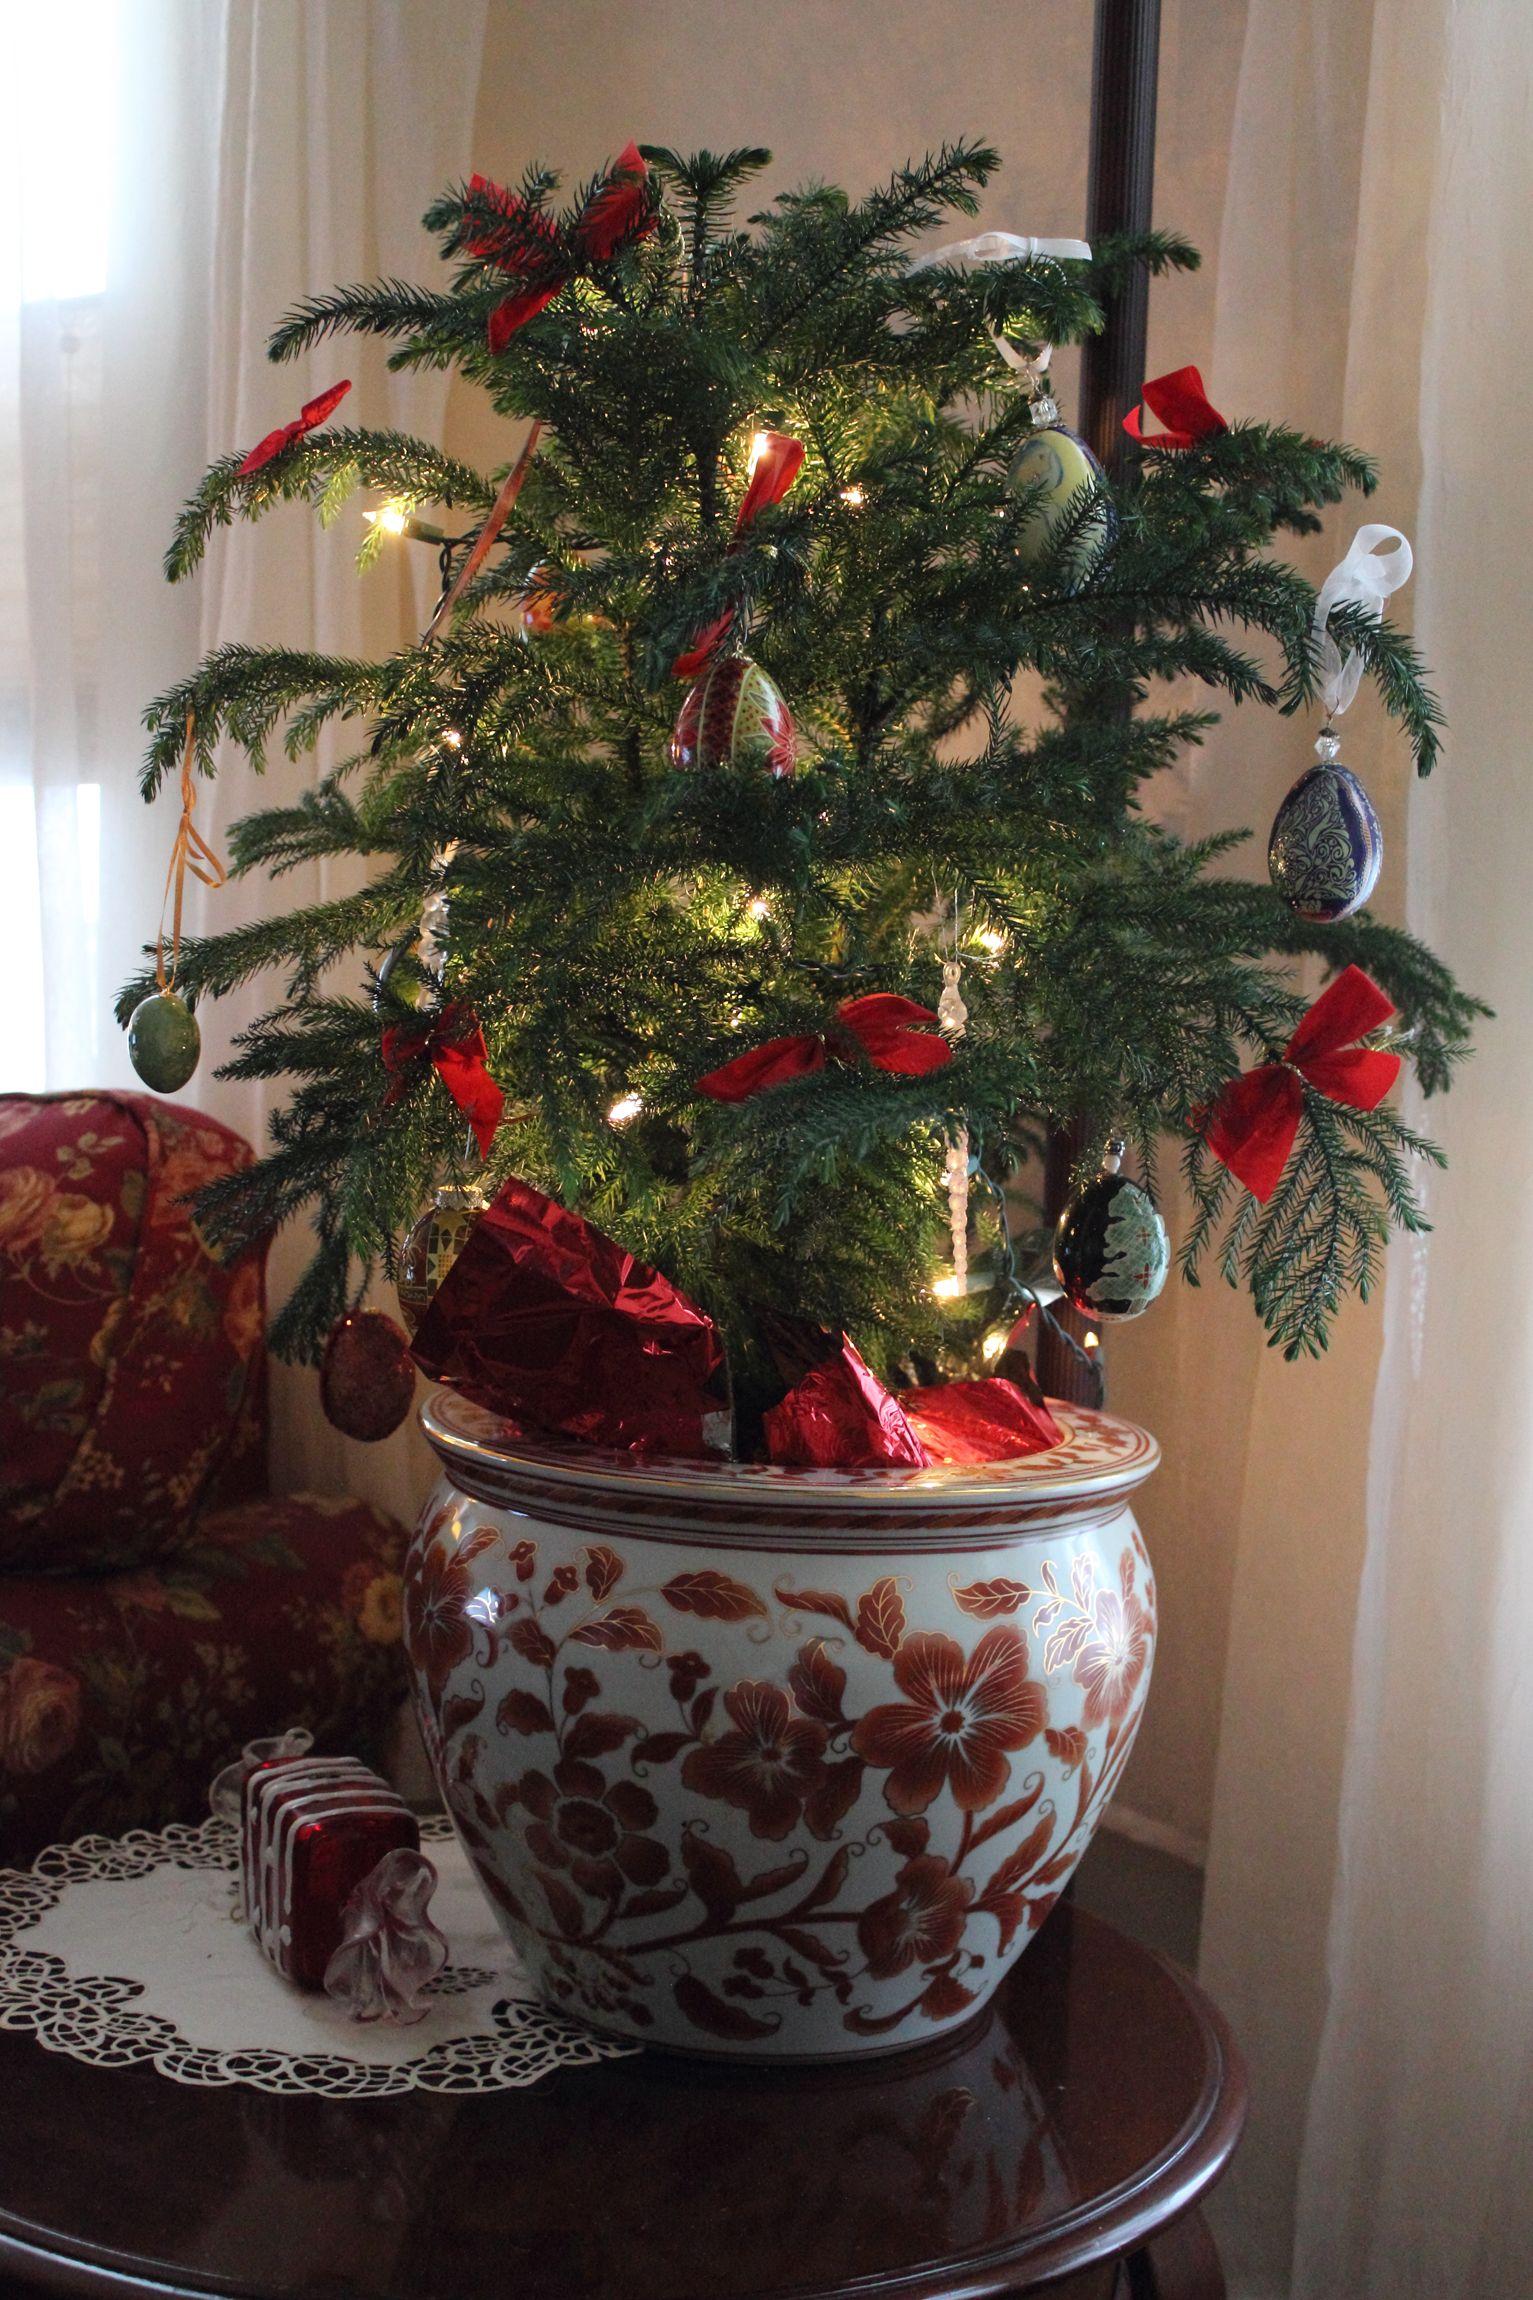 Norfolk Pine Christmas Tree. Handmade pysanky batik ornaments ...